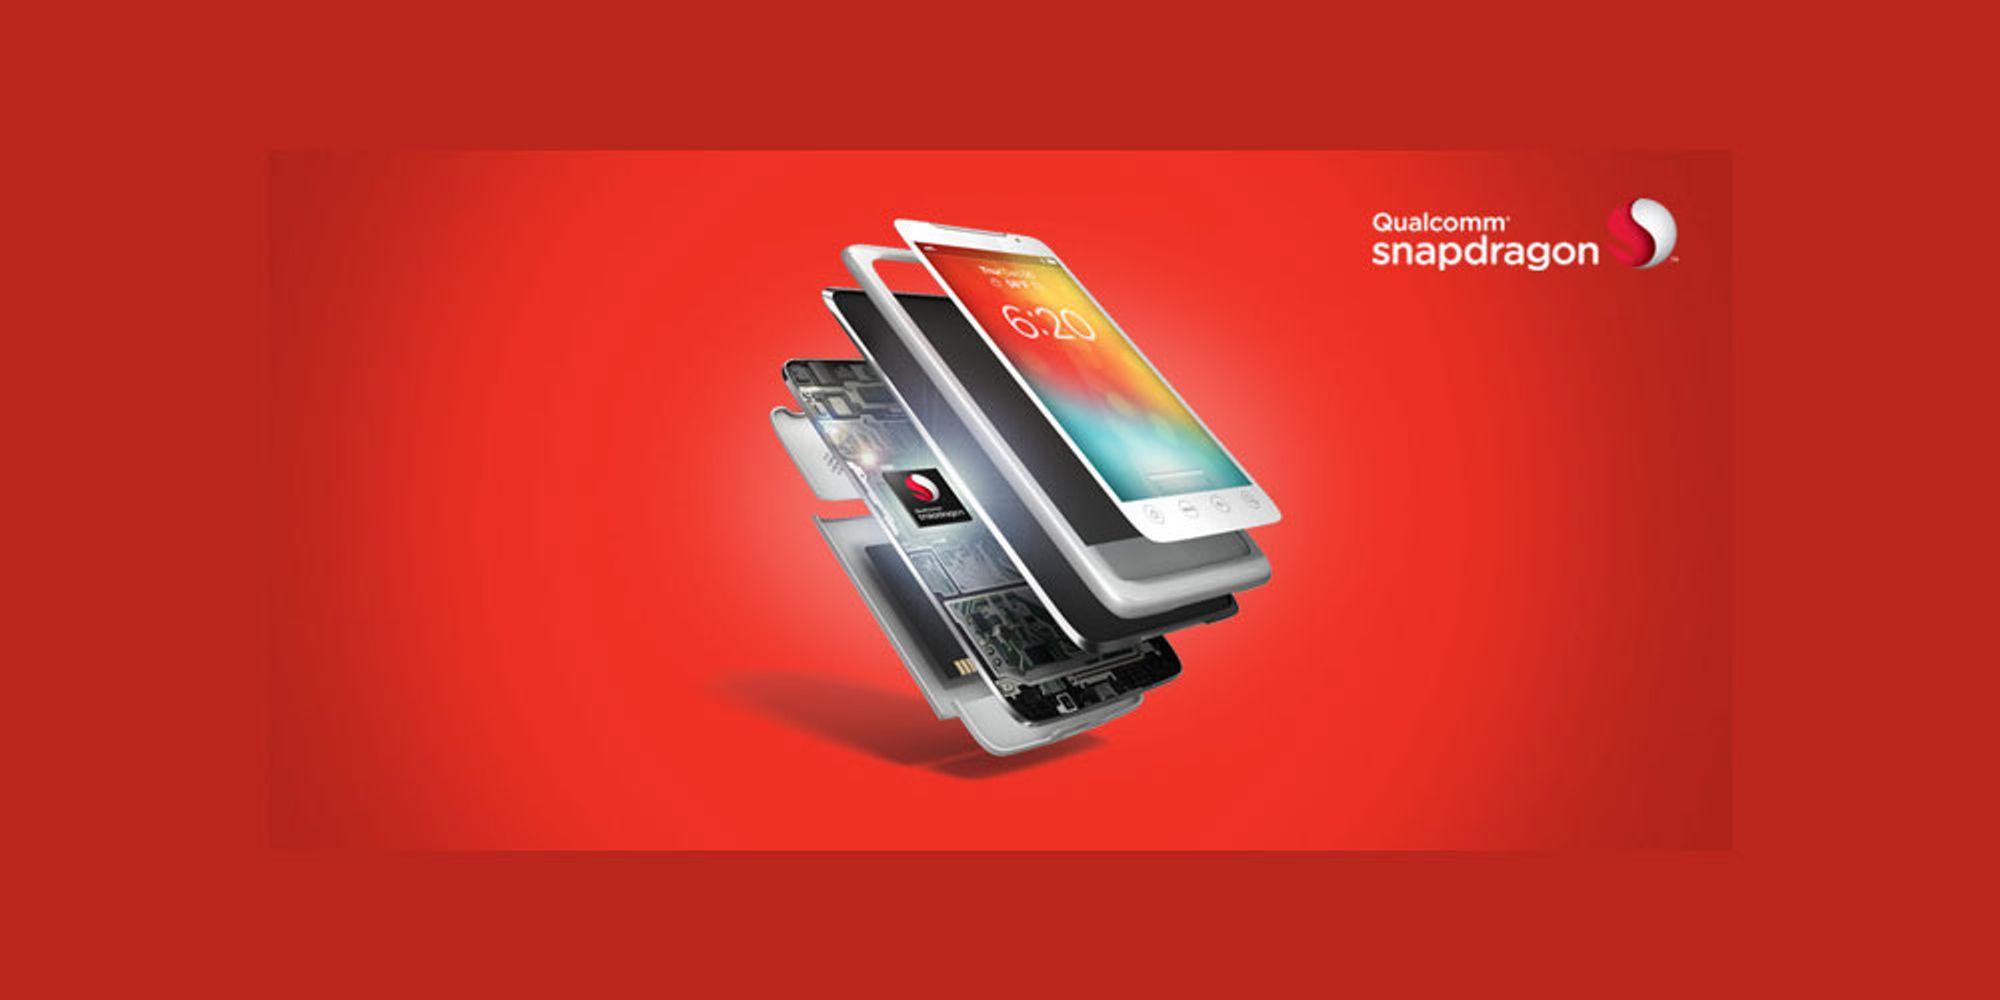 TEST: Qualcomm lanserer 6 nye Snapdragon-brikker